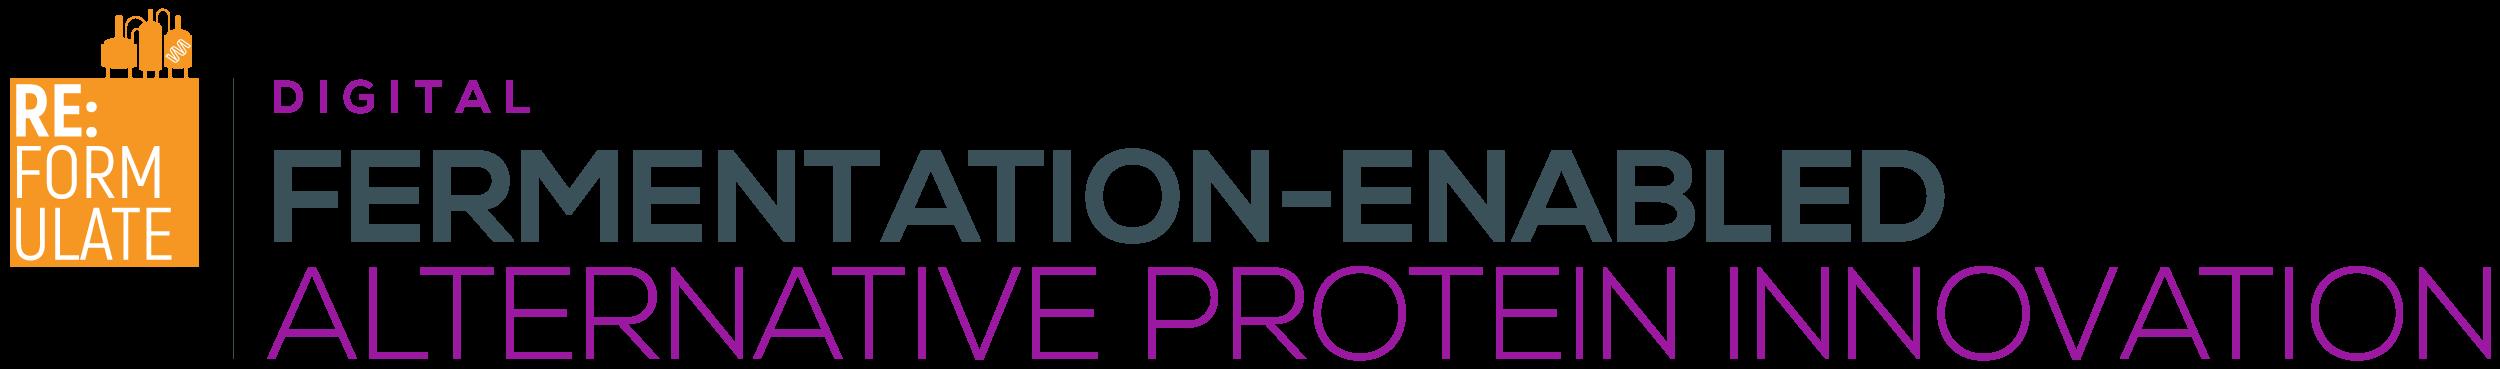 5099_Fermentation-Enabled_Alternative_Protein_Innovation_Summit_2020_Logo_FINAL